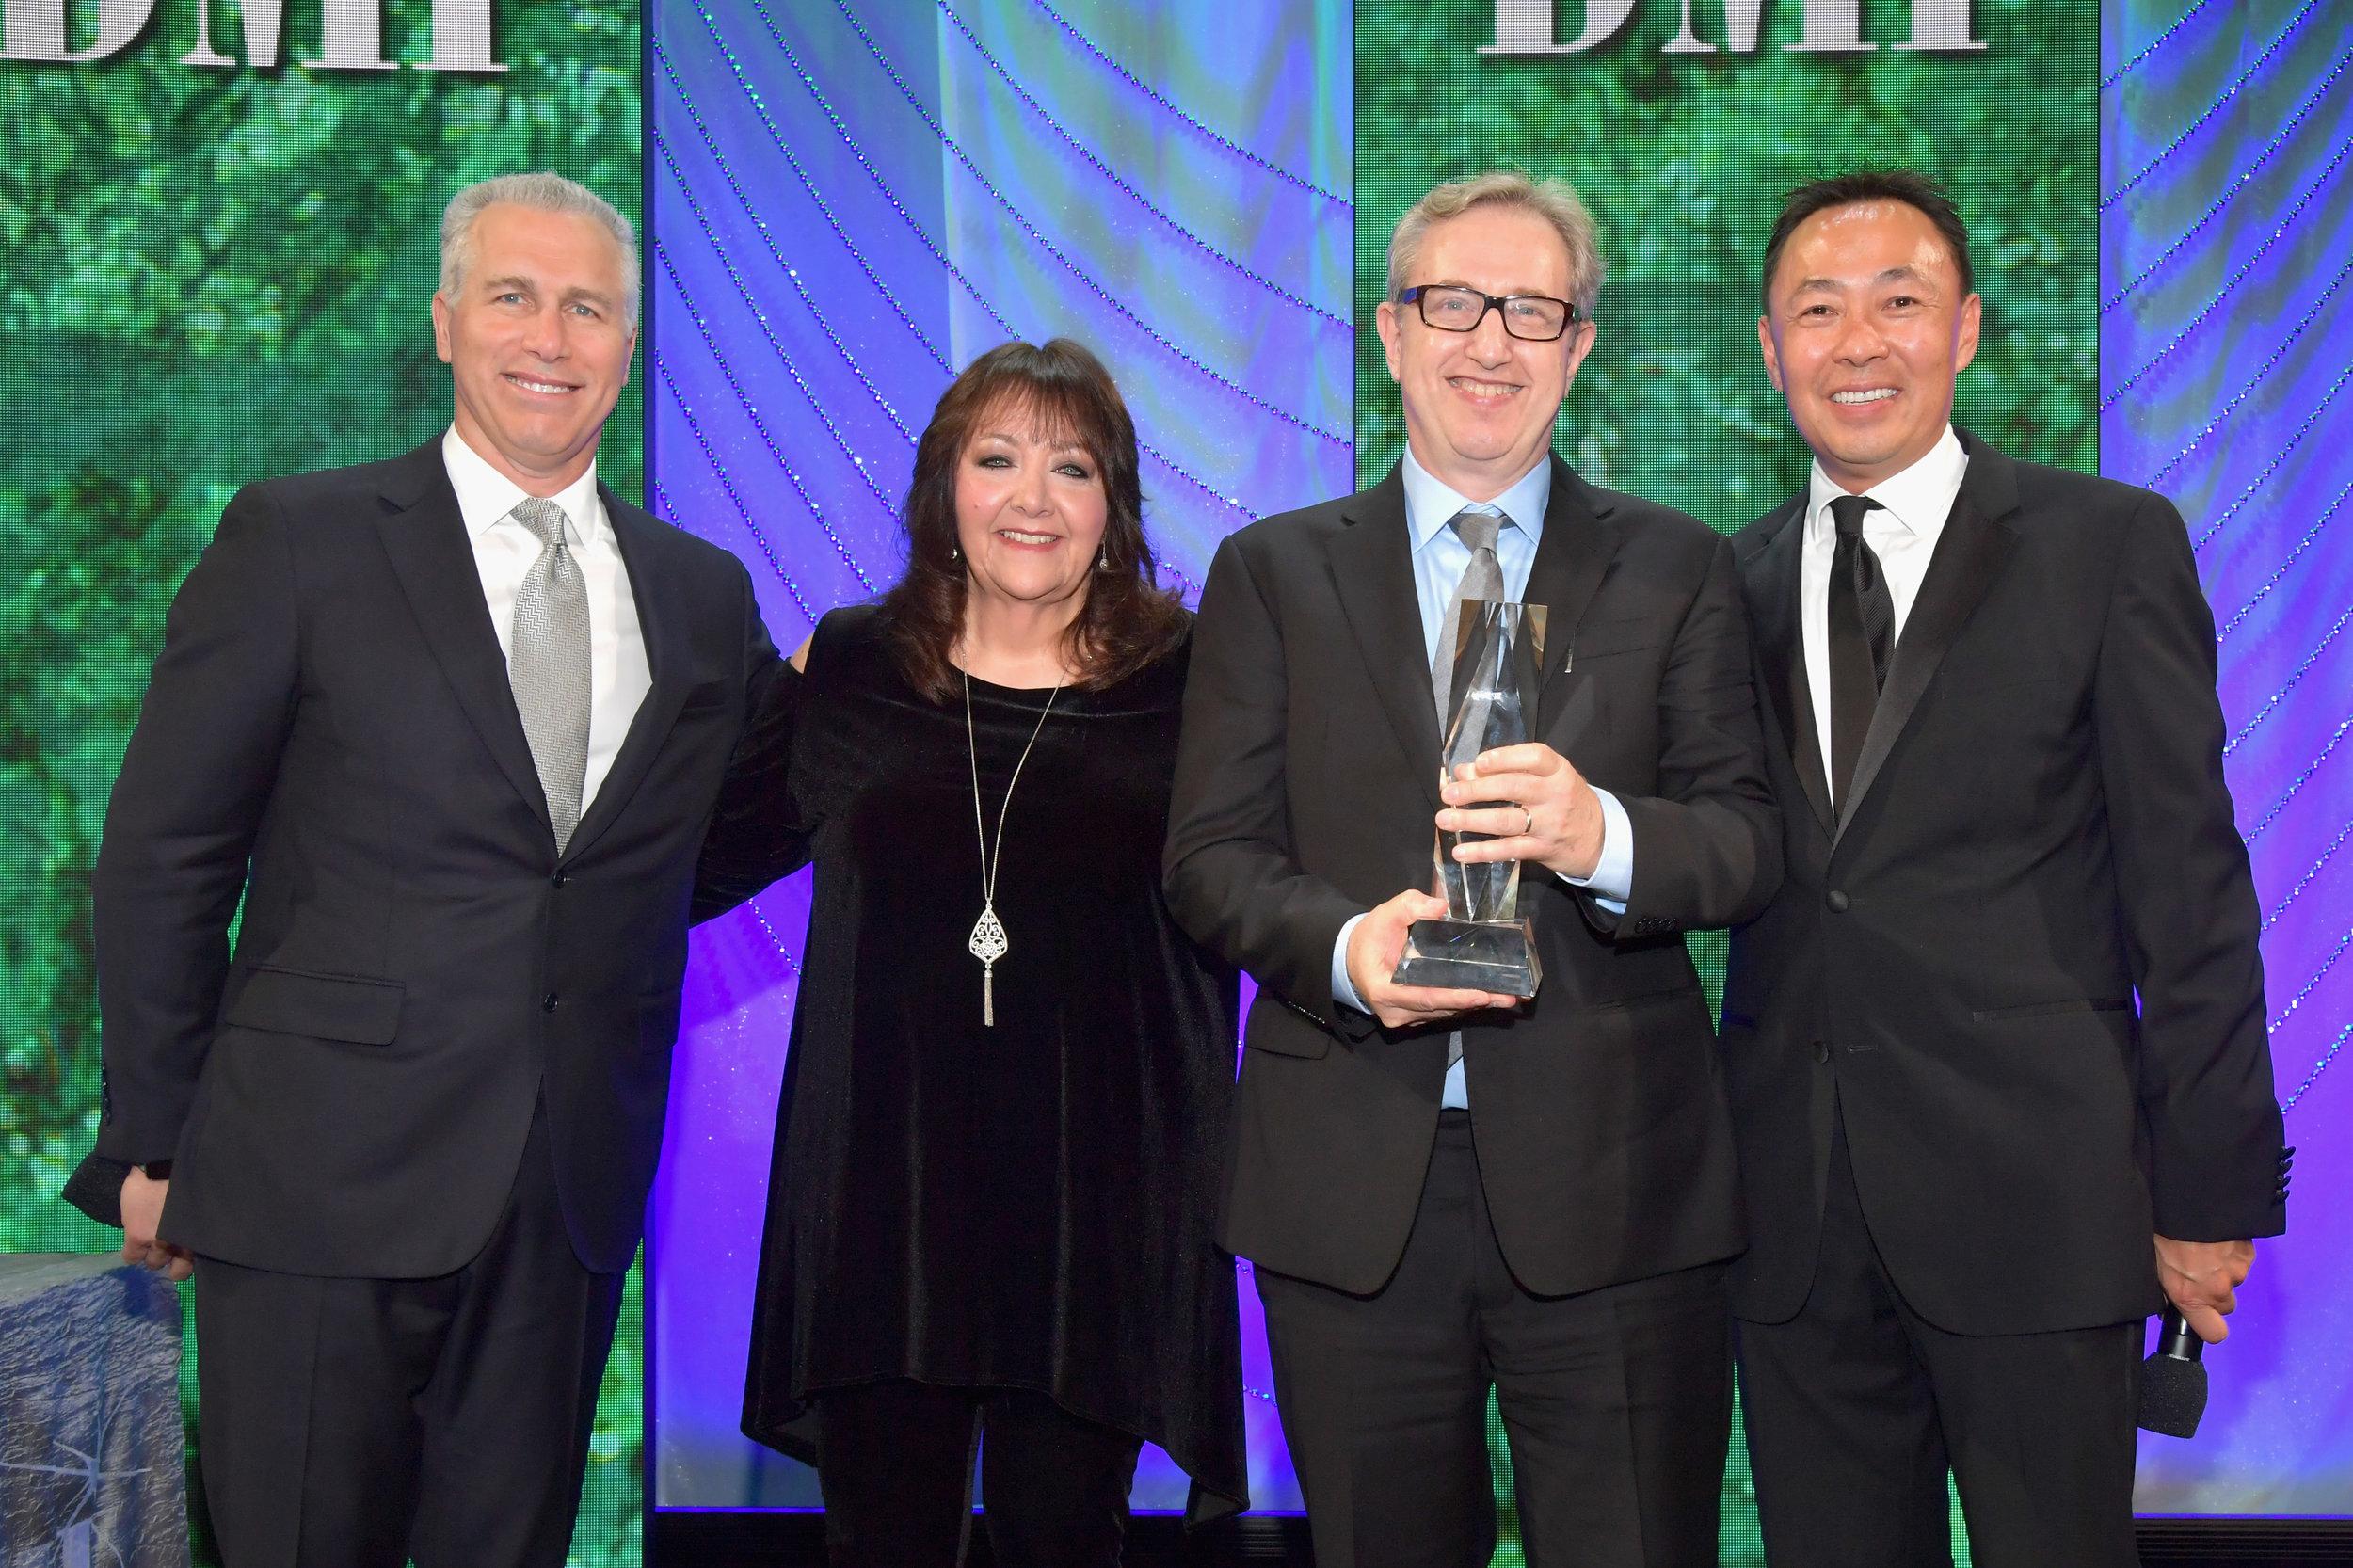 Rick Baitz  accepts award BMI Classic Contribution Award from BMI Vice President, Creative - Film, TV & Visual Media  Doreen Ringer Ross , Executive Vice President of Creative & Licensing at BMI  Mike Steinberg  and BMI Assistant Vice President of Creative, Los Angeles  Ray Yee